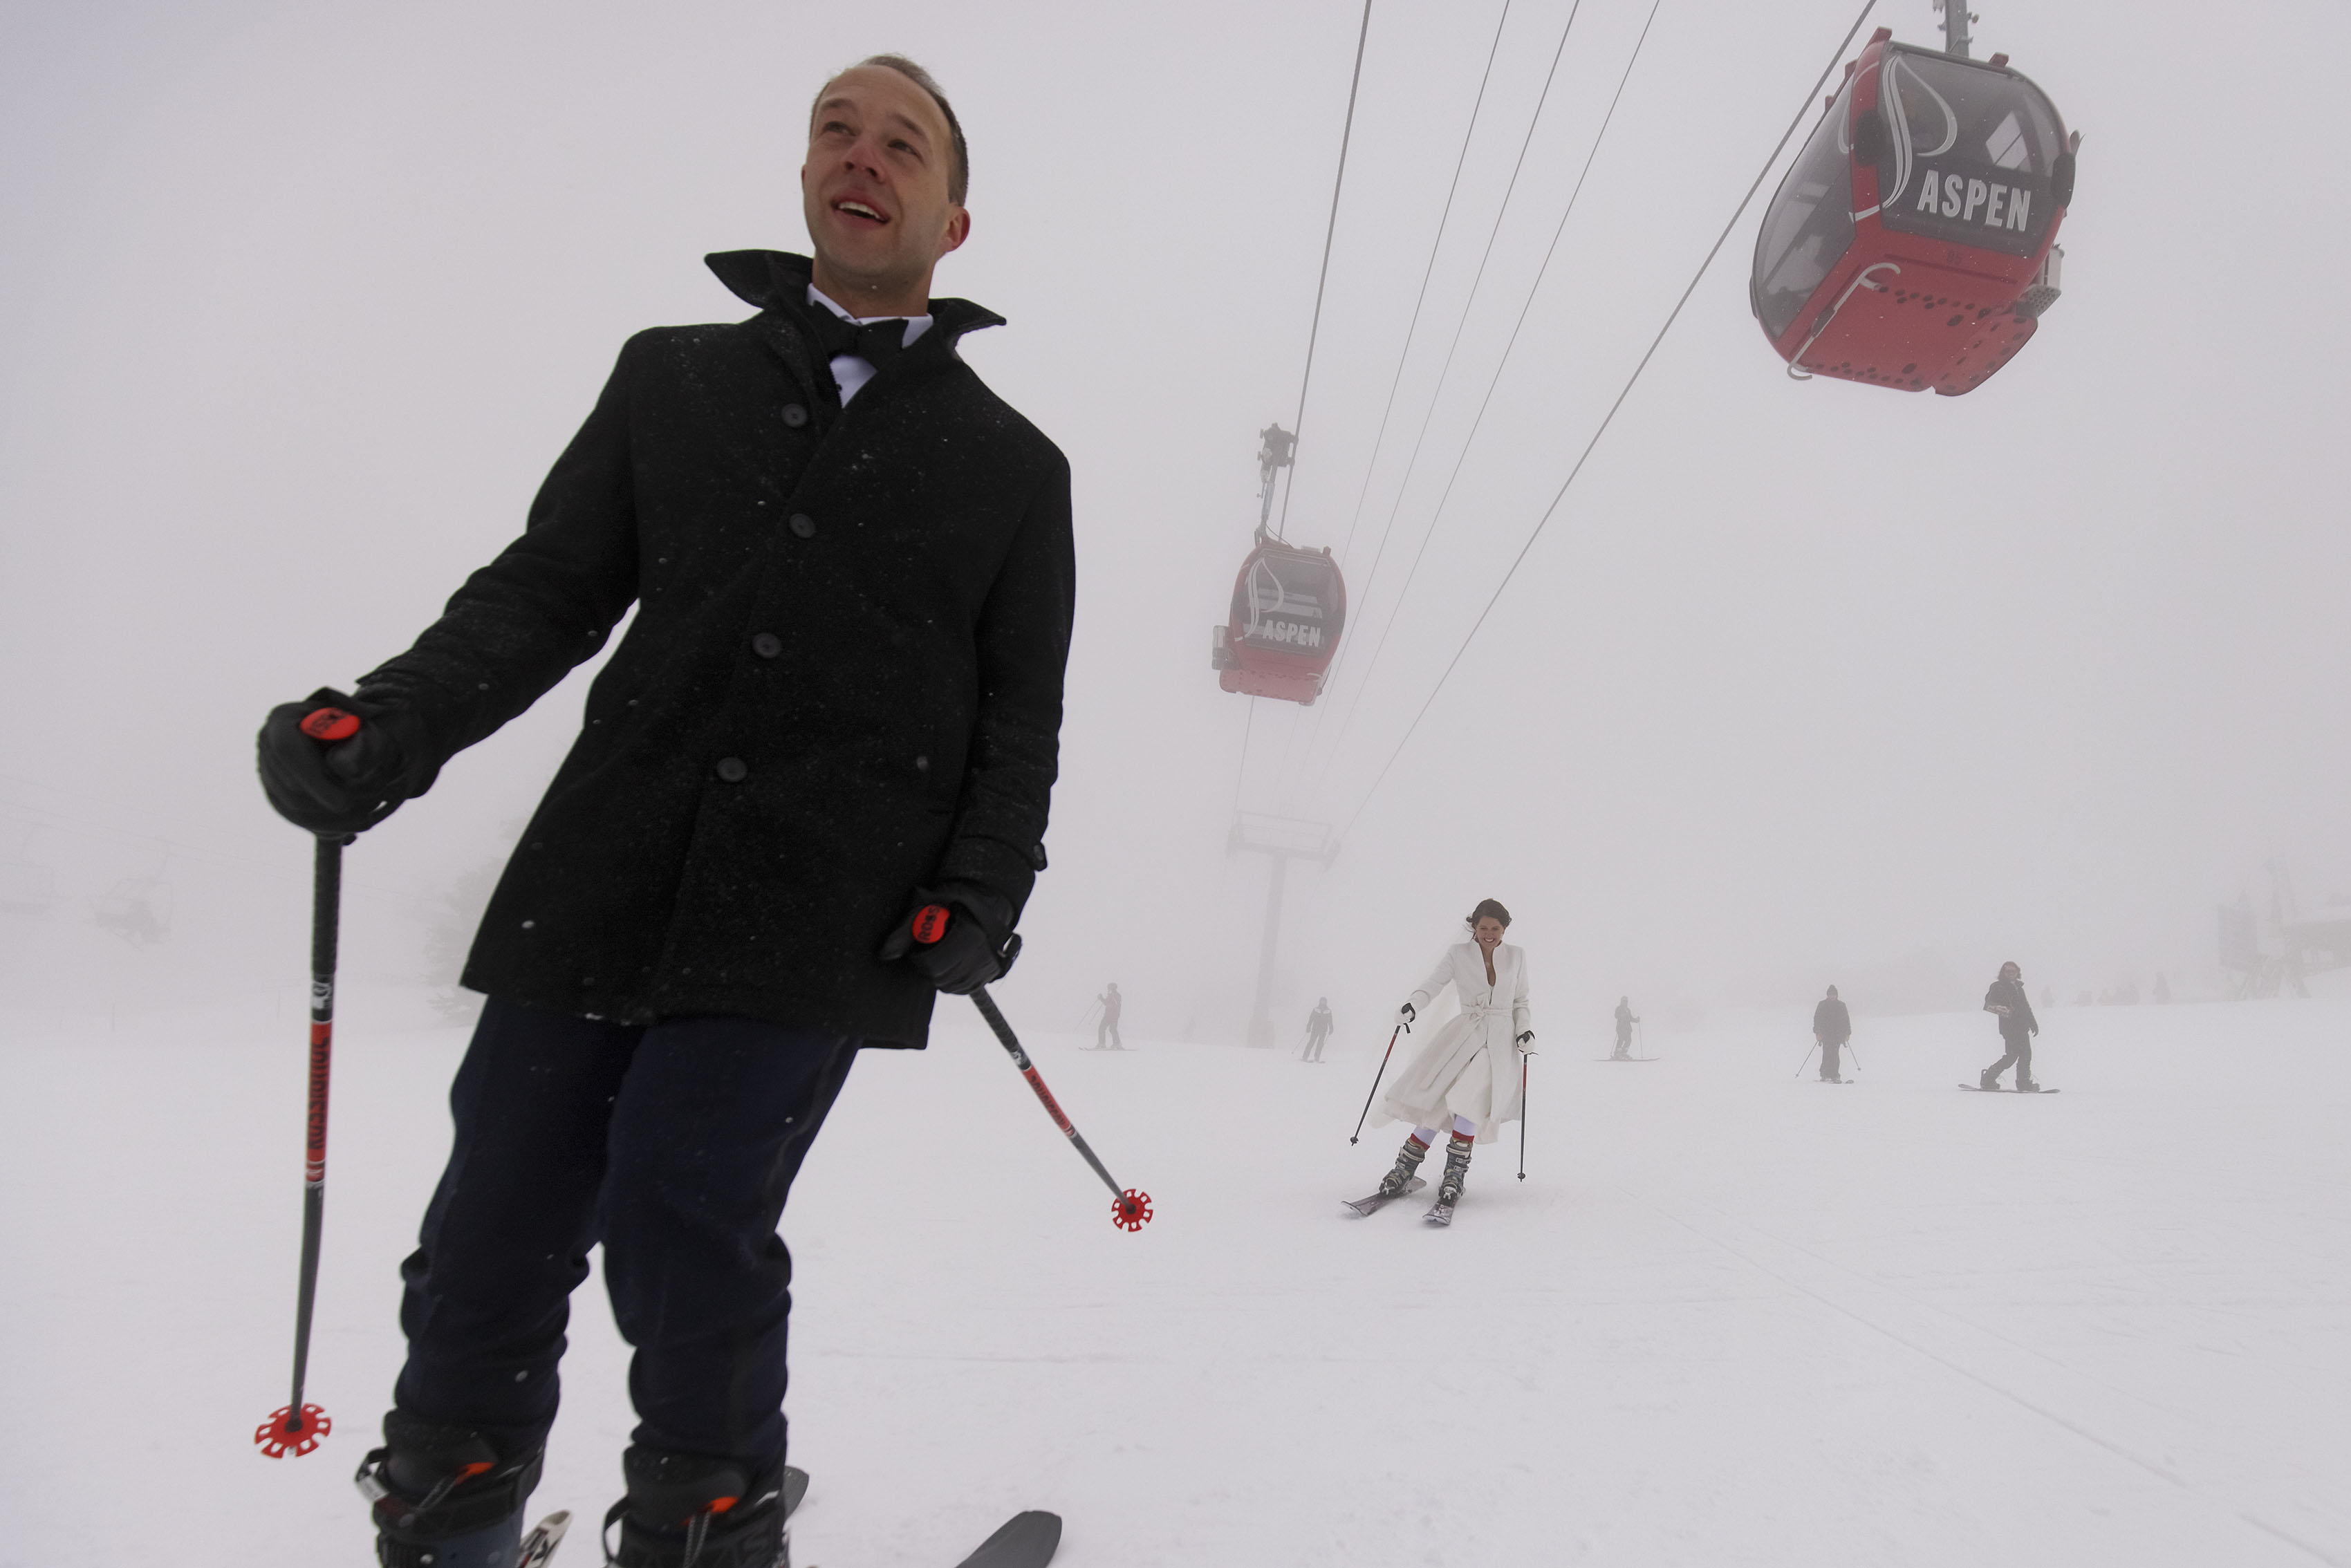 The newlyweds ski down Aspen mountain following their winter micro wedding ceremony